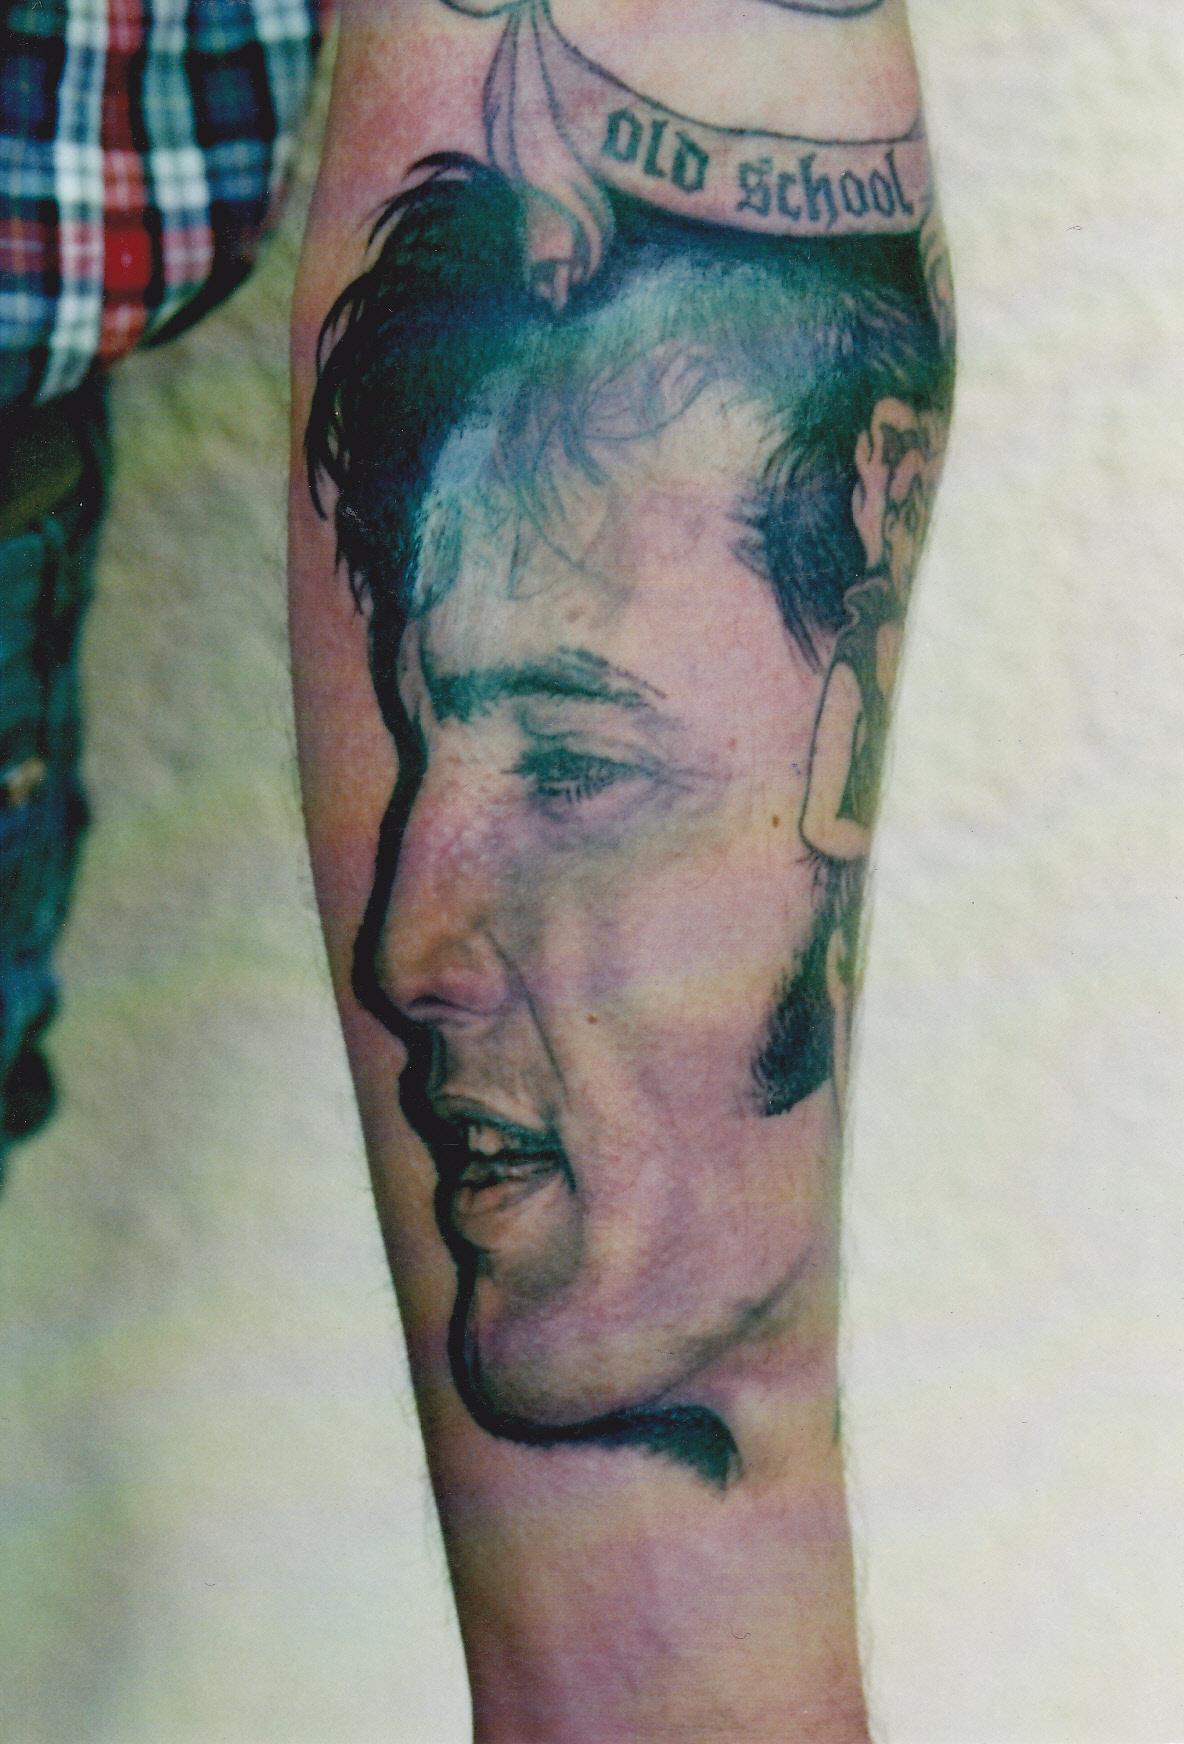 Wilde 13 Tattoo Esslingen